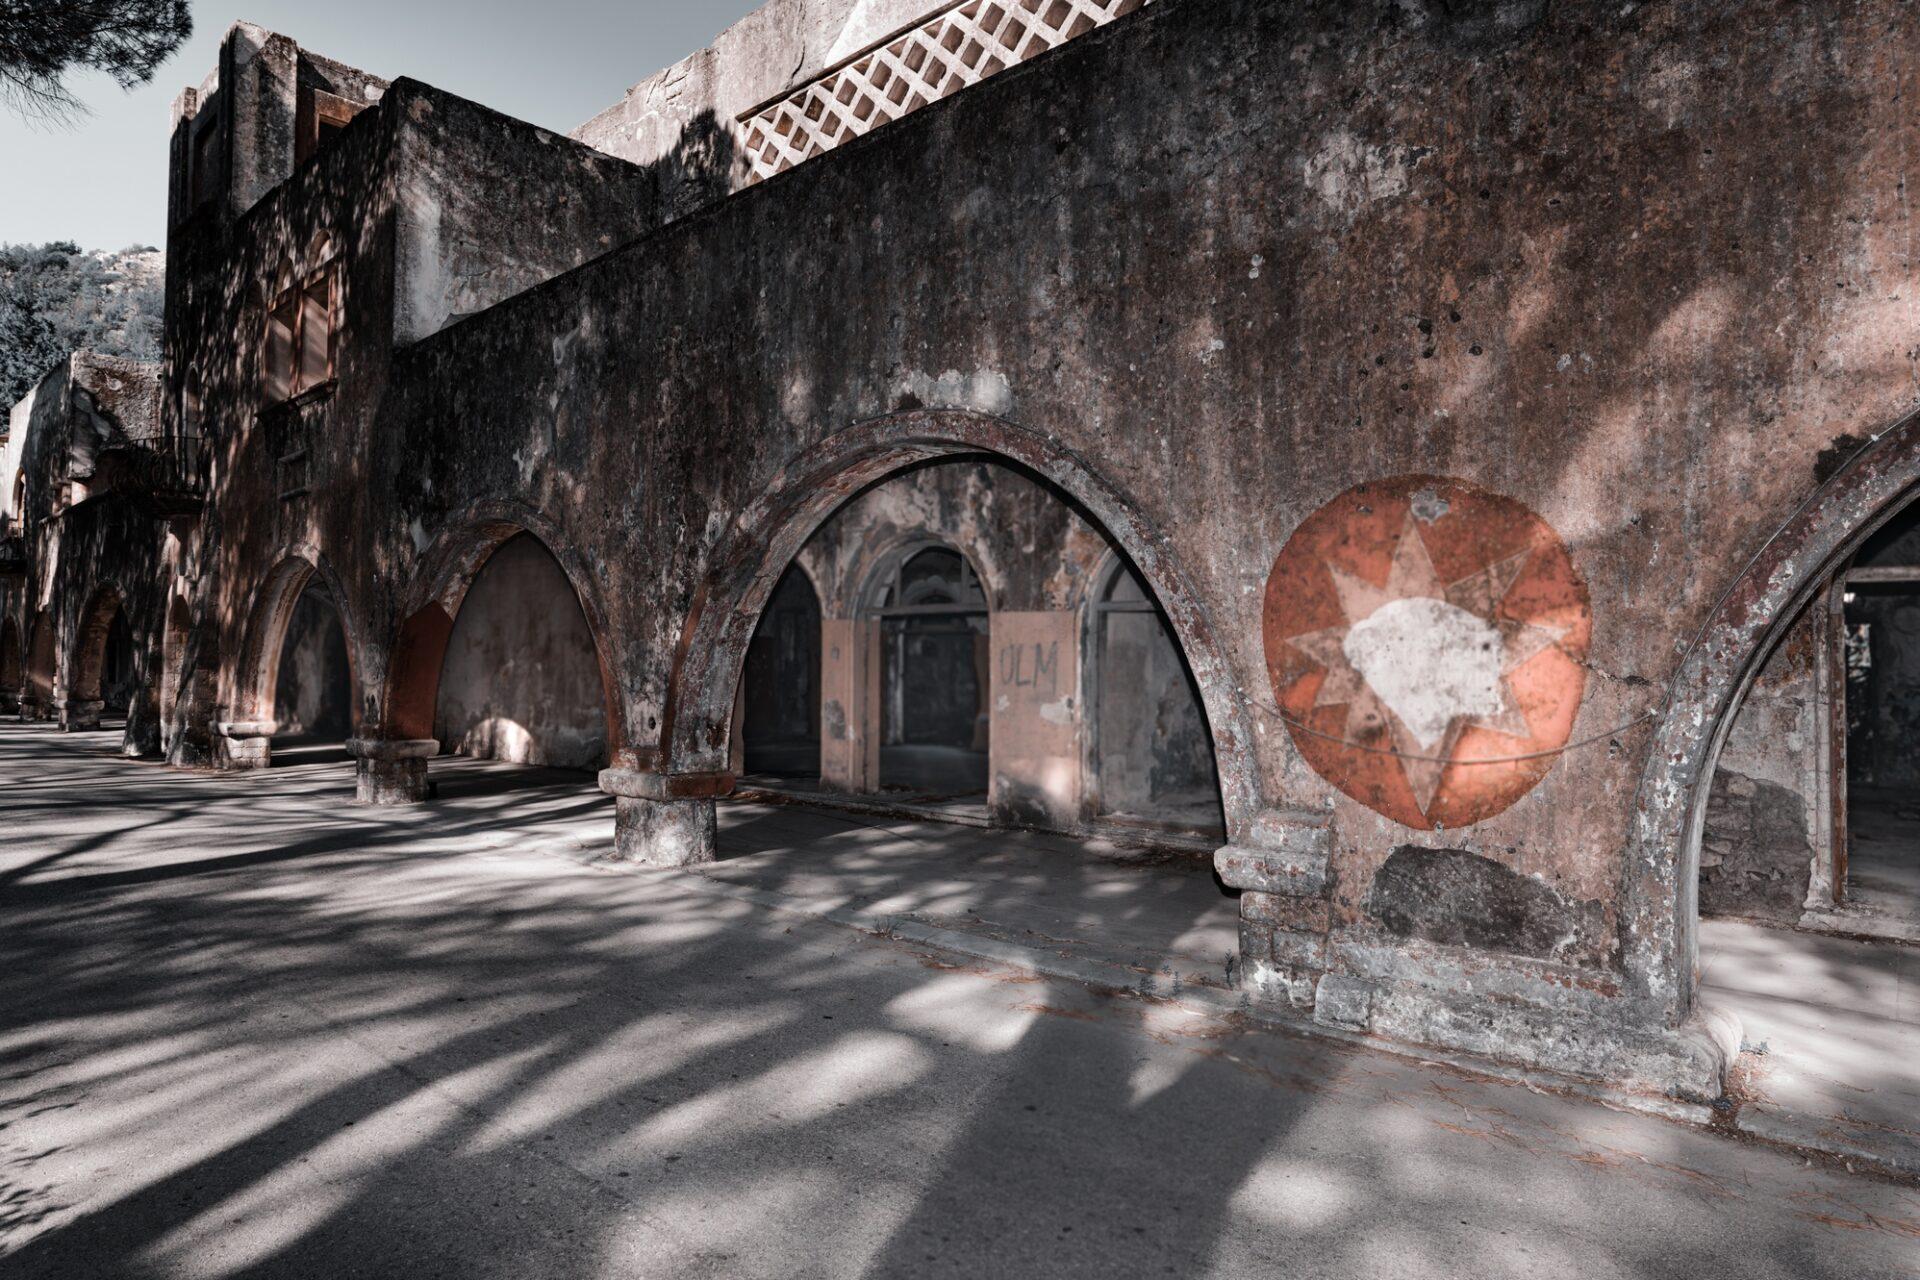 Rhodes Travel Photography | THE PHOTOKITCHEN